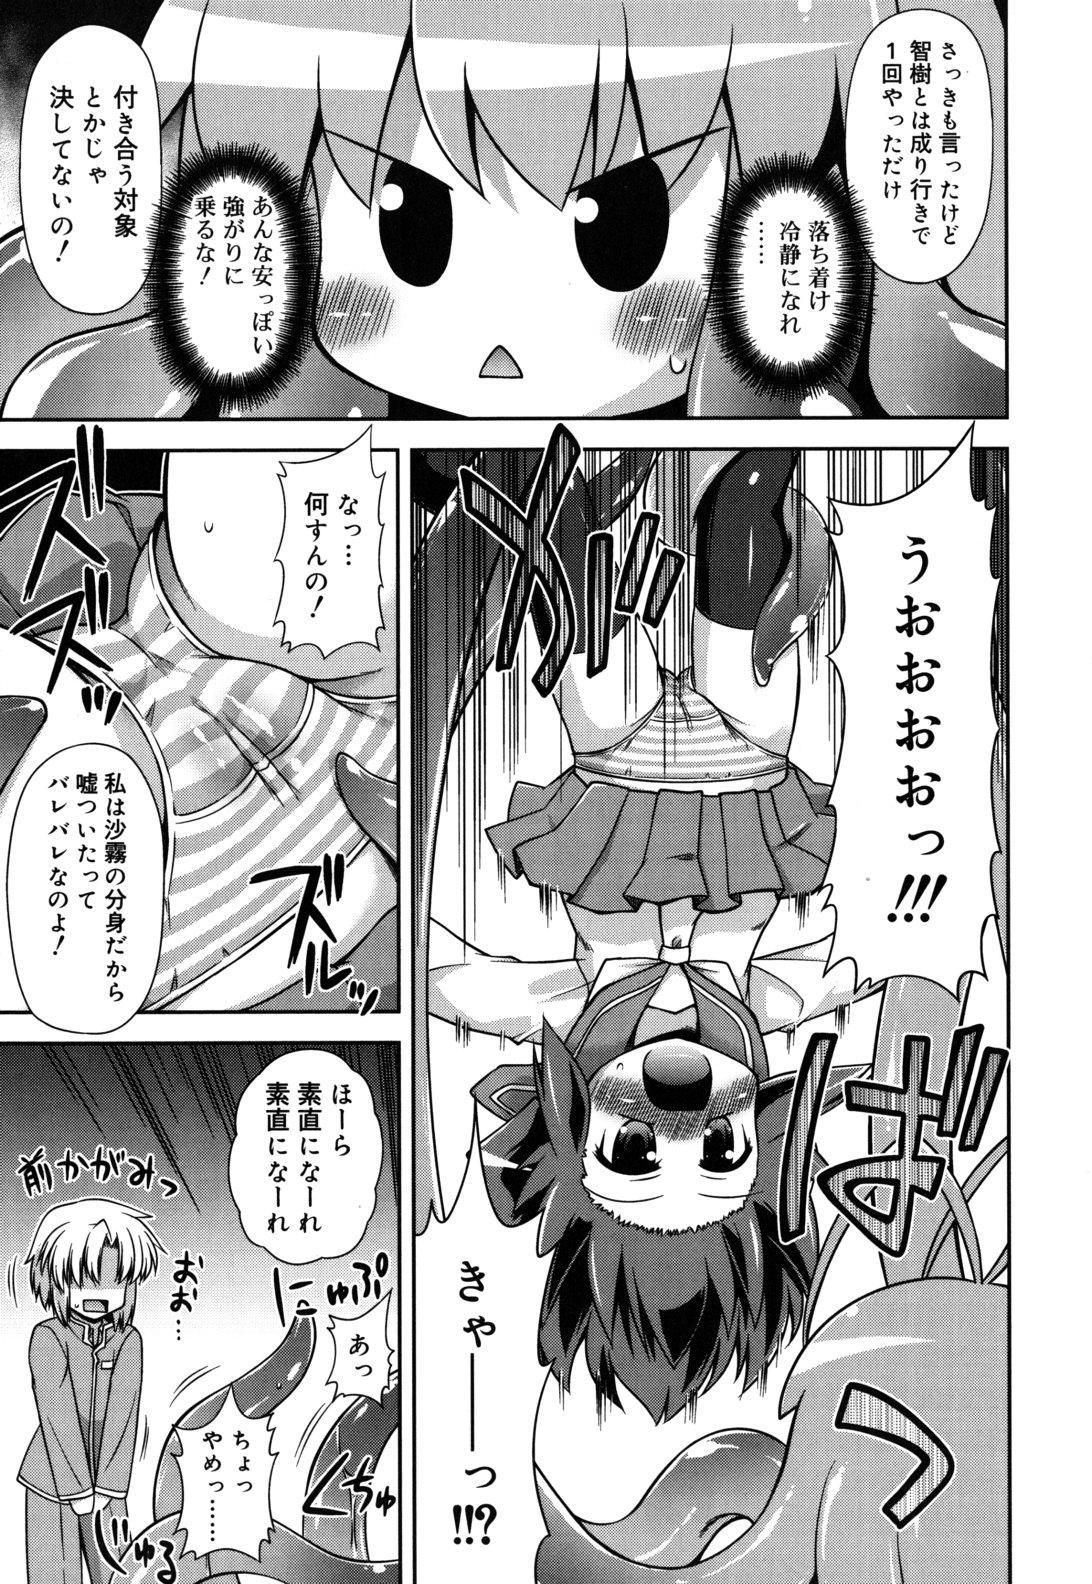 Chimatto Chaos Chikku 31